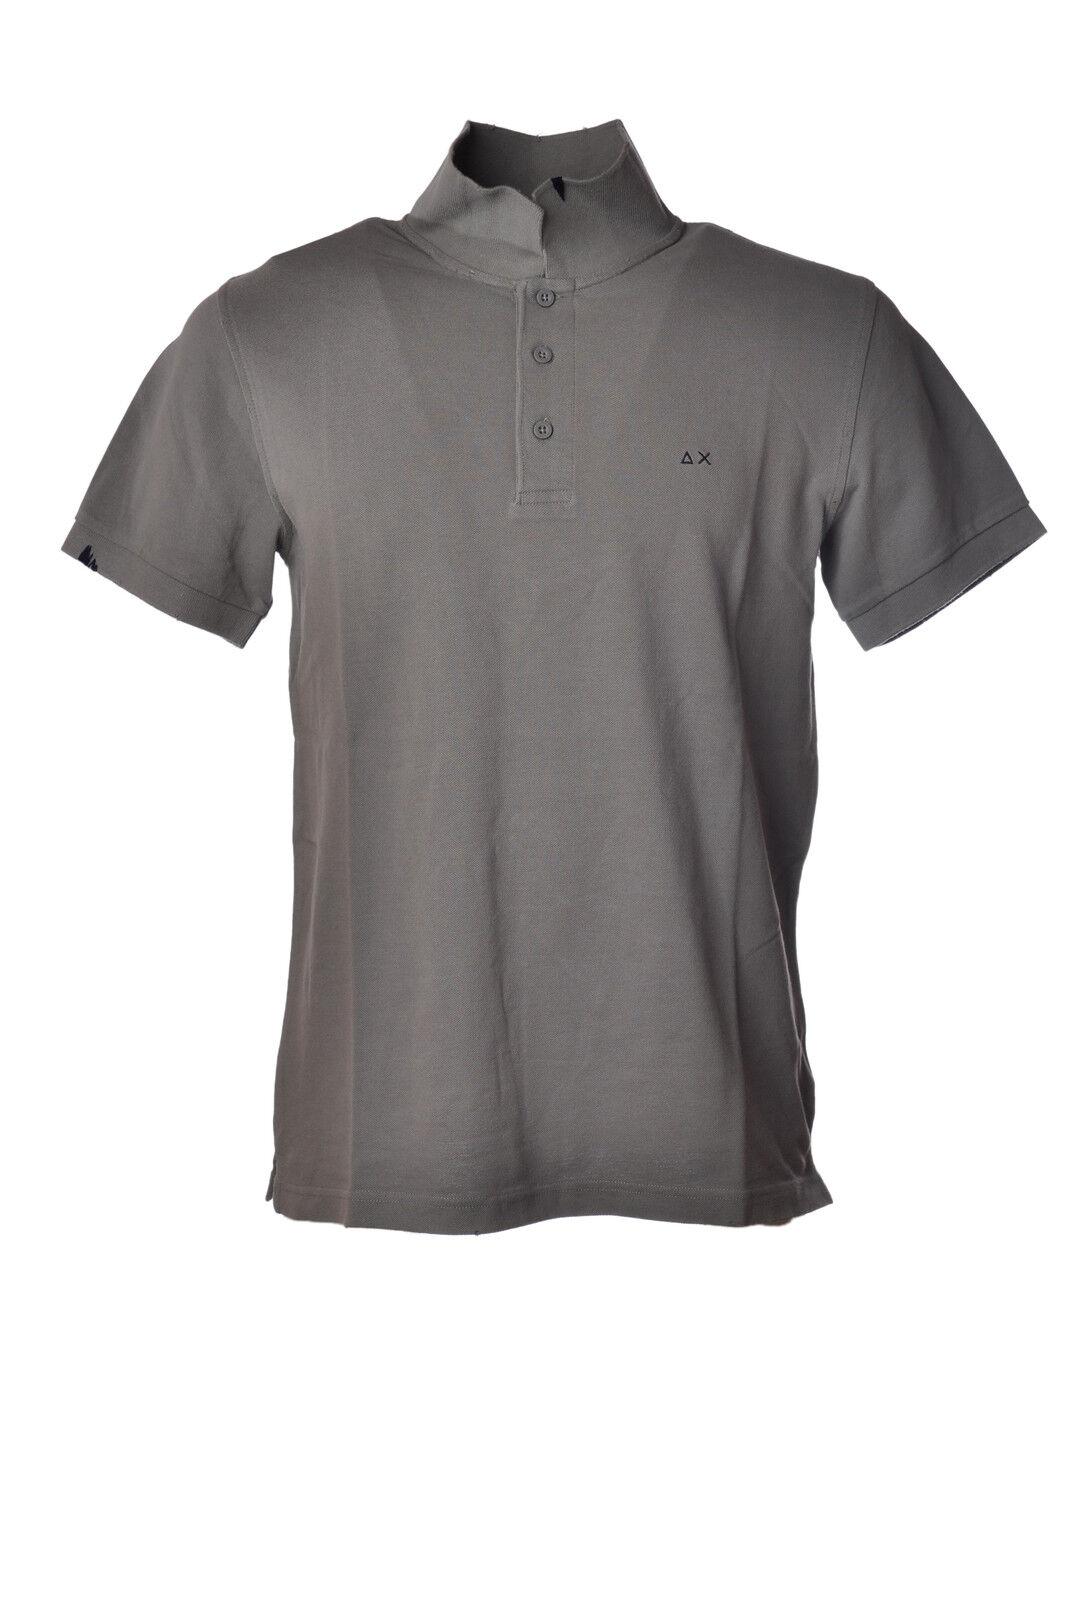 Sun 68 - Topwear-Polo - Man - Grau - 3192315G184205